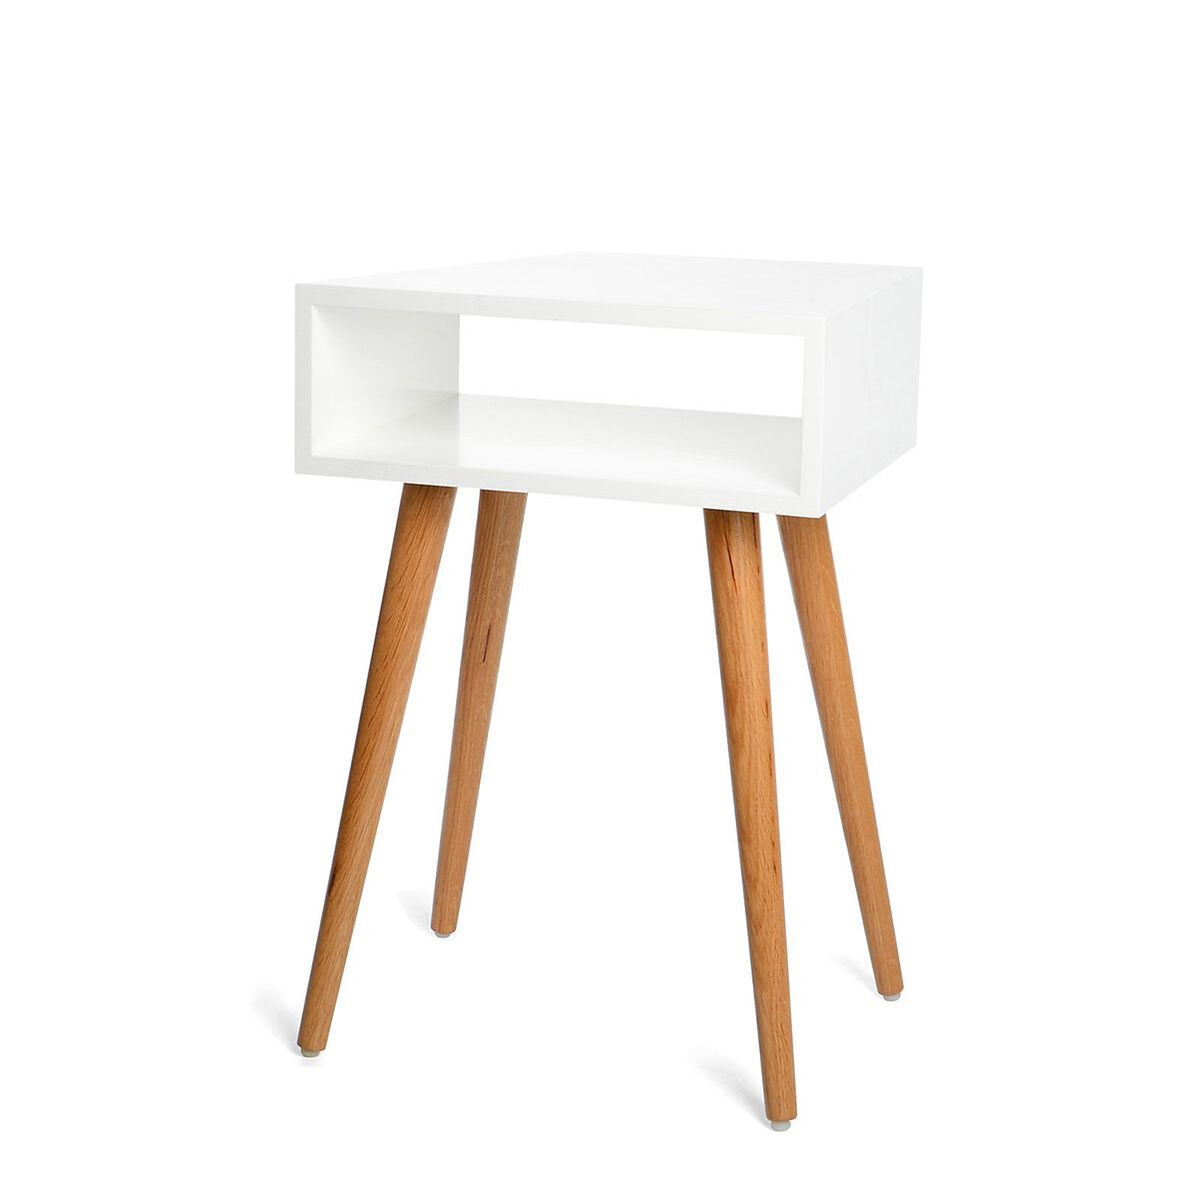 beistelltisch eiche wei ca l 40 x b 30 x h 60 cm depot de. Black Bedroom Furniture Sets. Home Design Ideas